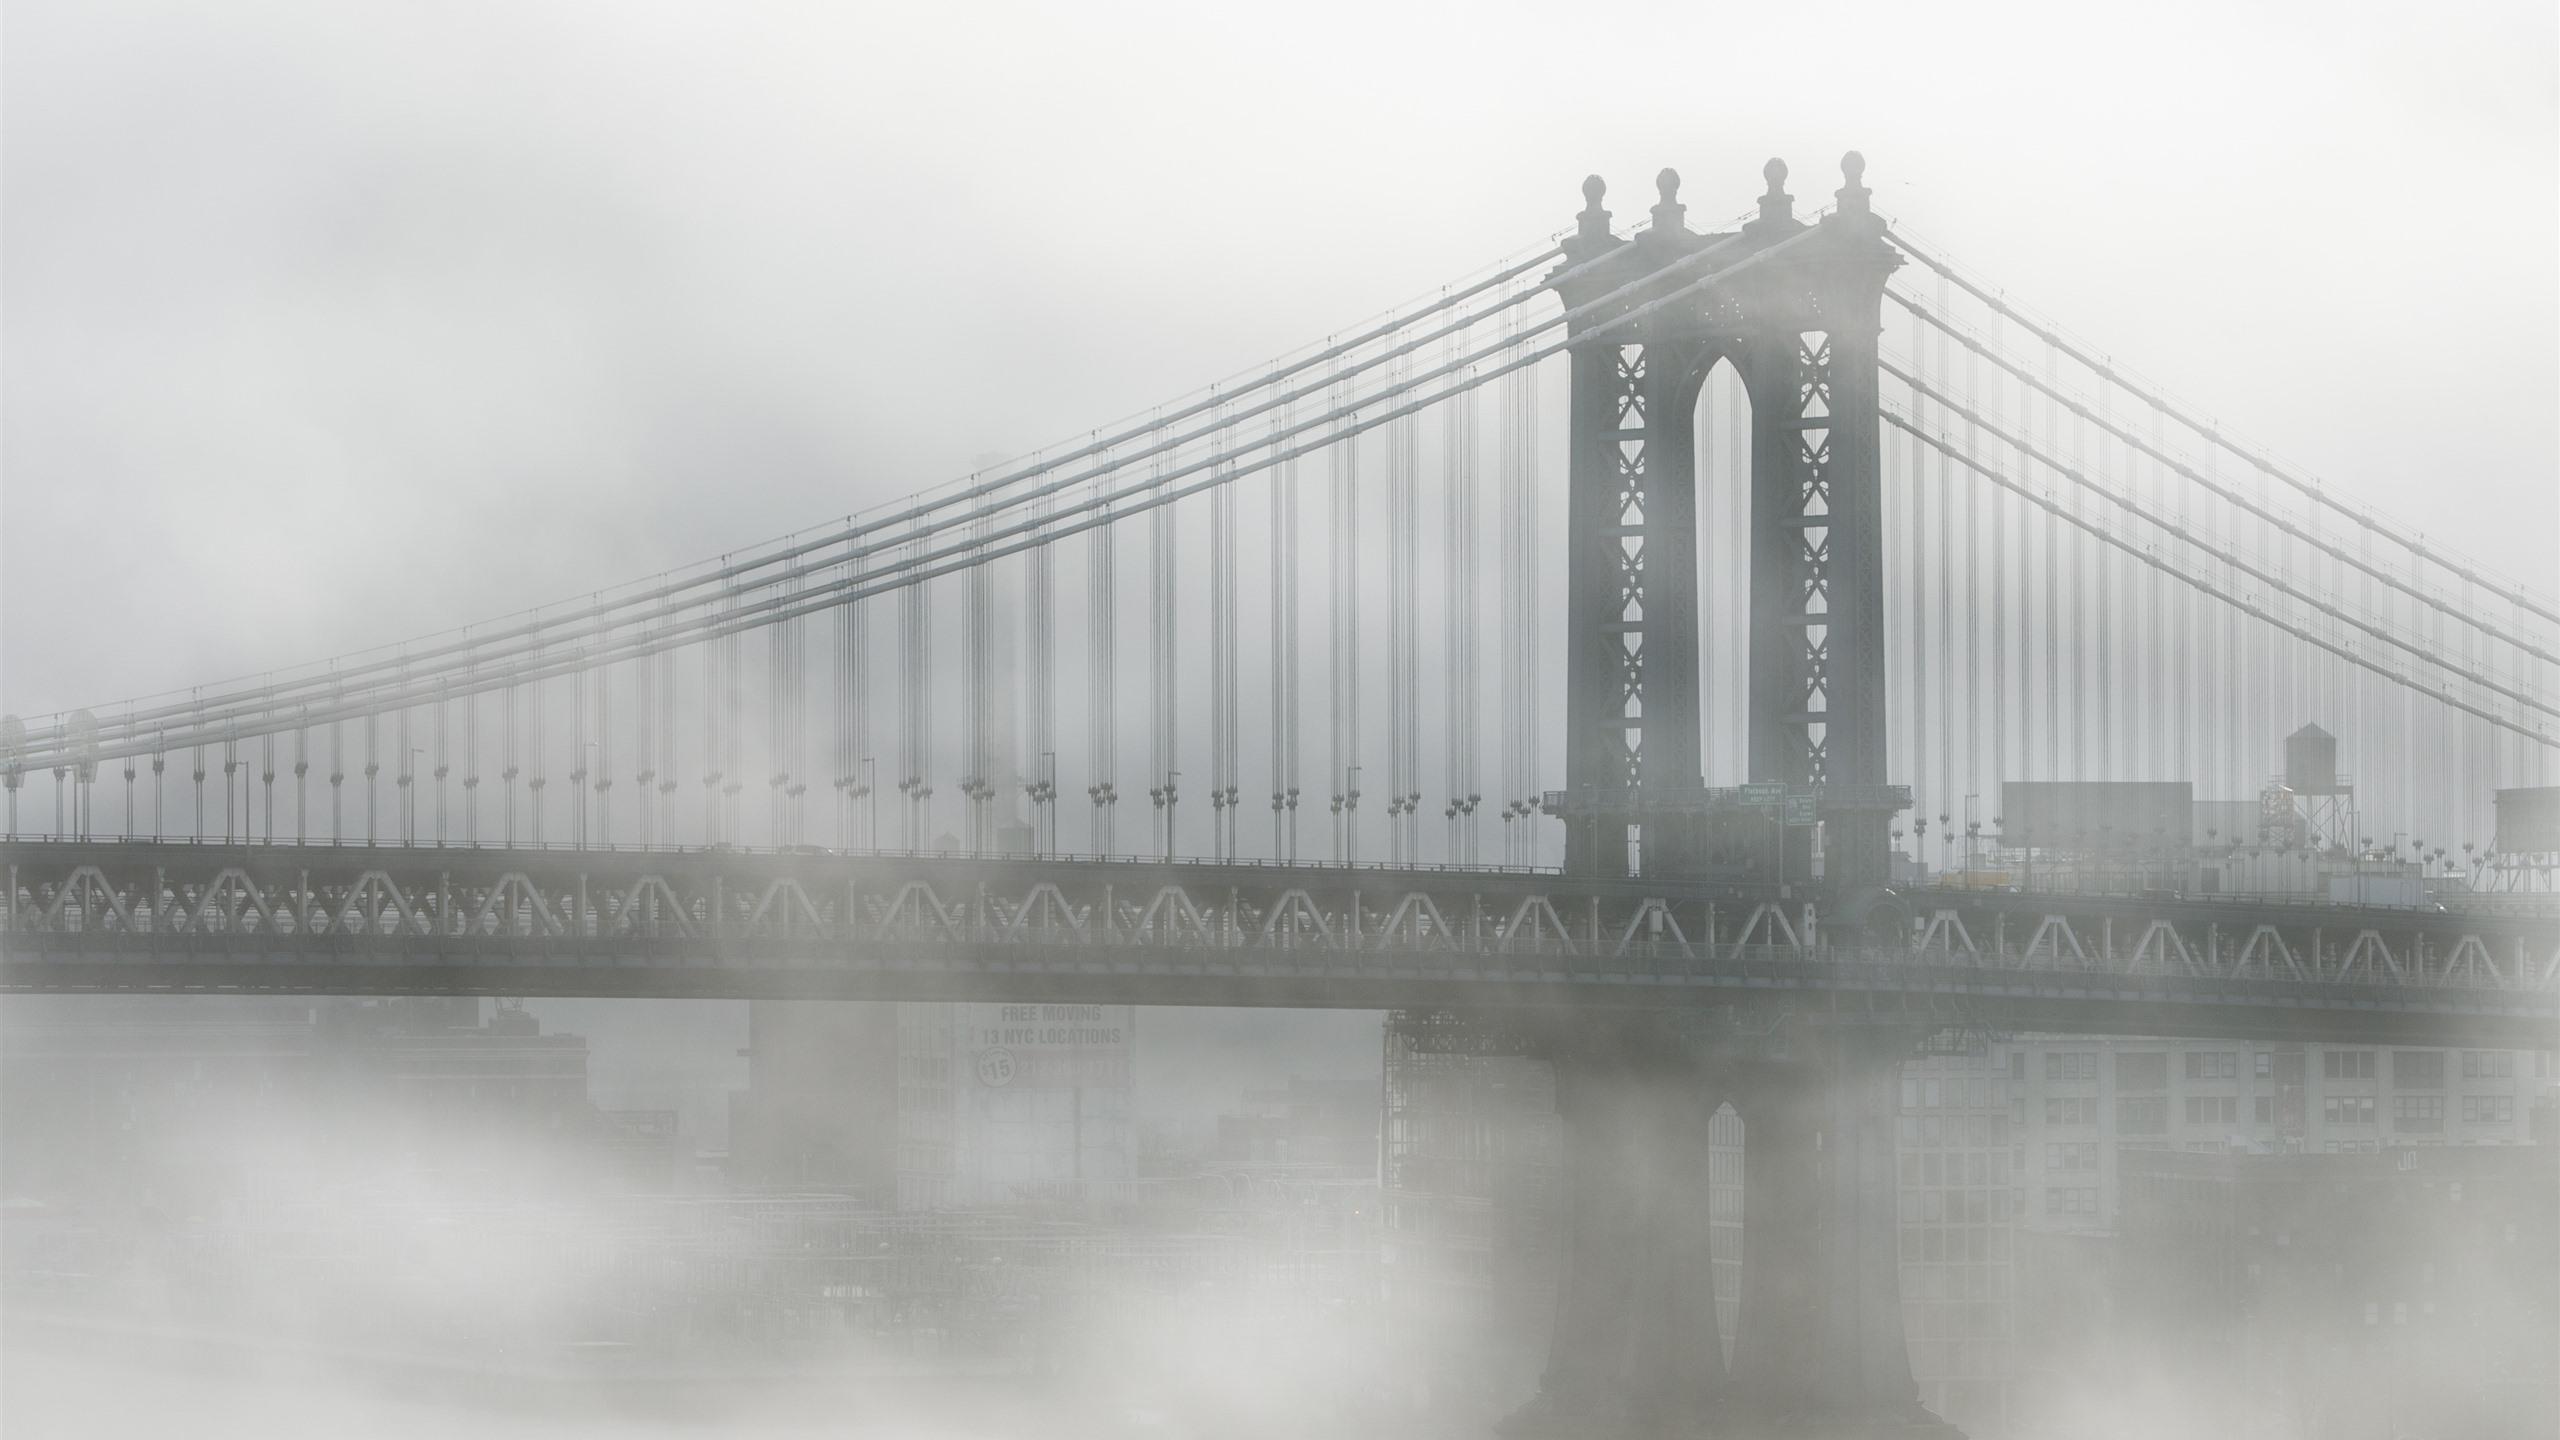 Usa New York Brooklyn Bridge Fog Morning 1242x2688